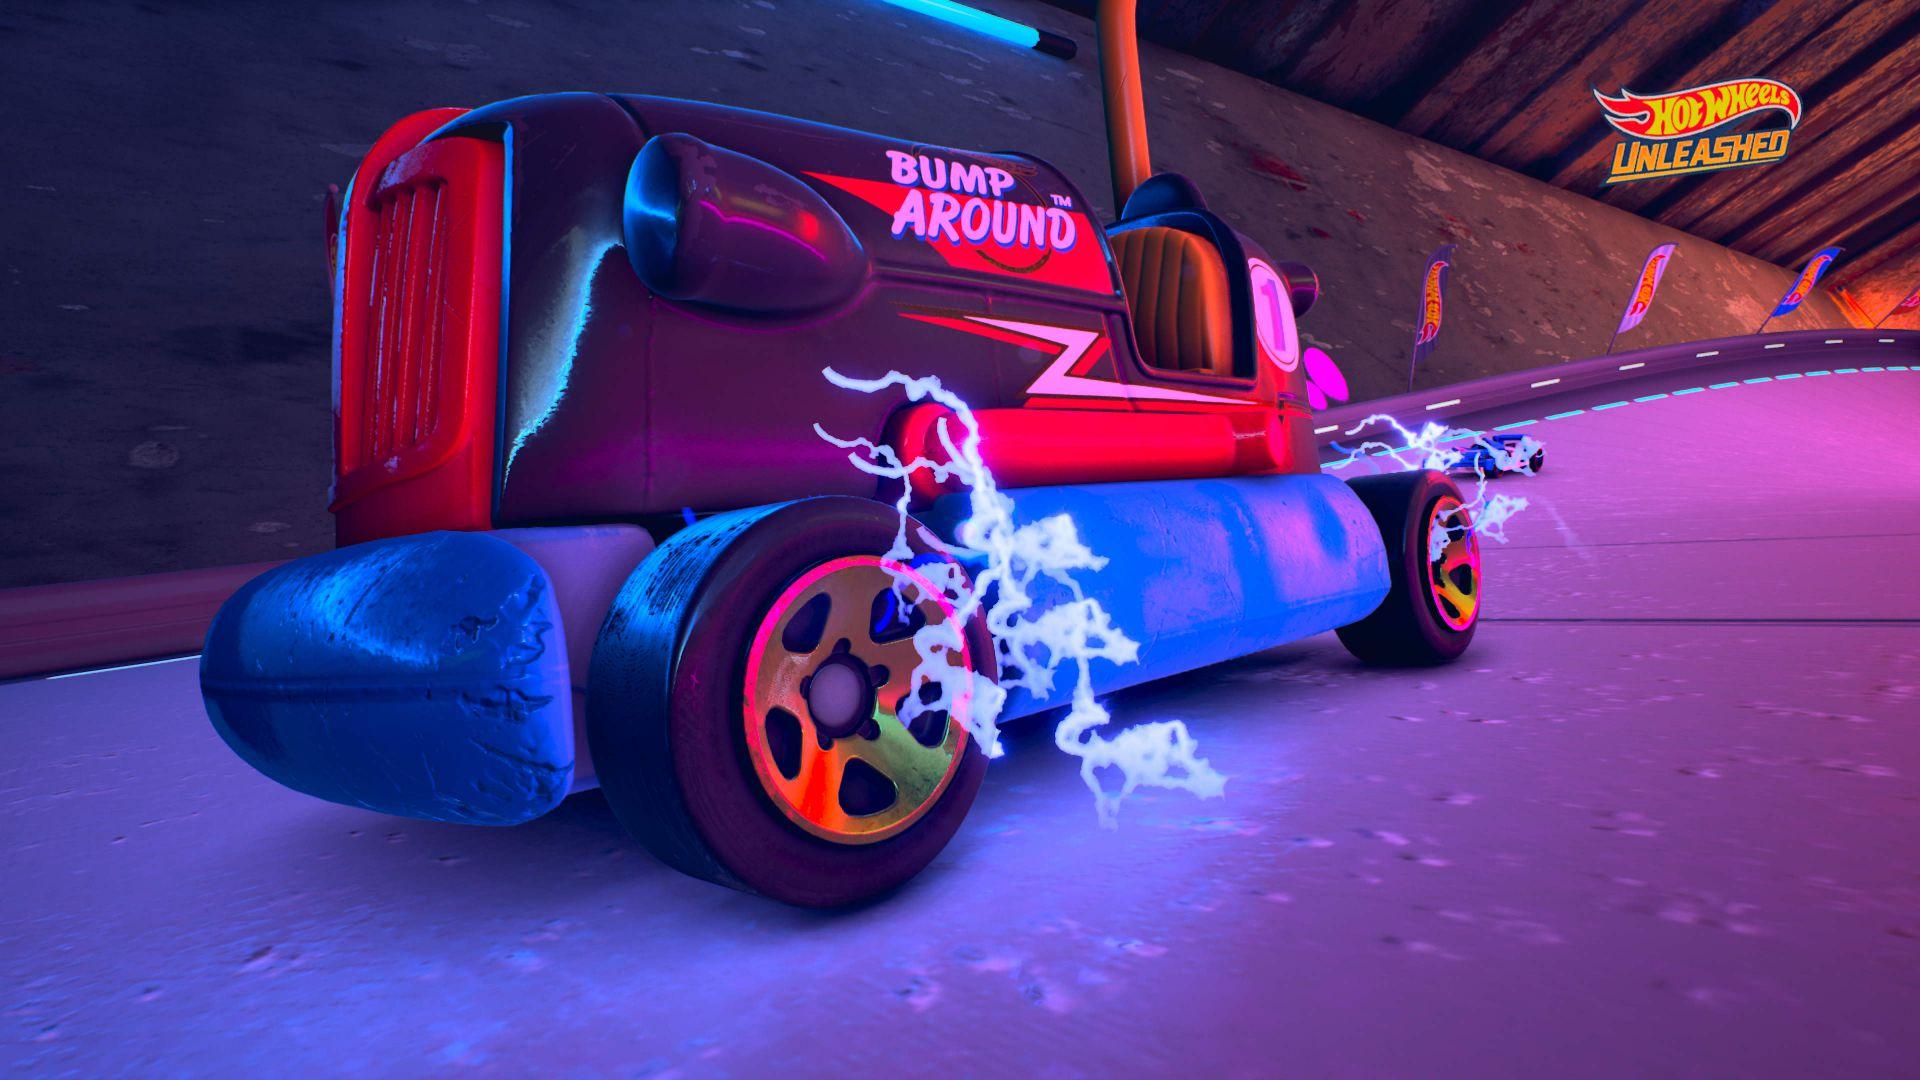 hot wheels unleashed - generacion xbox